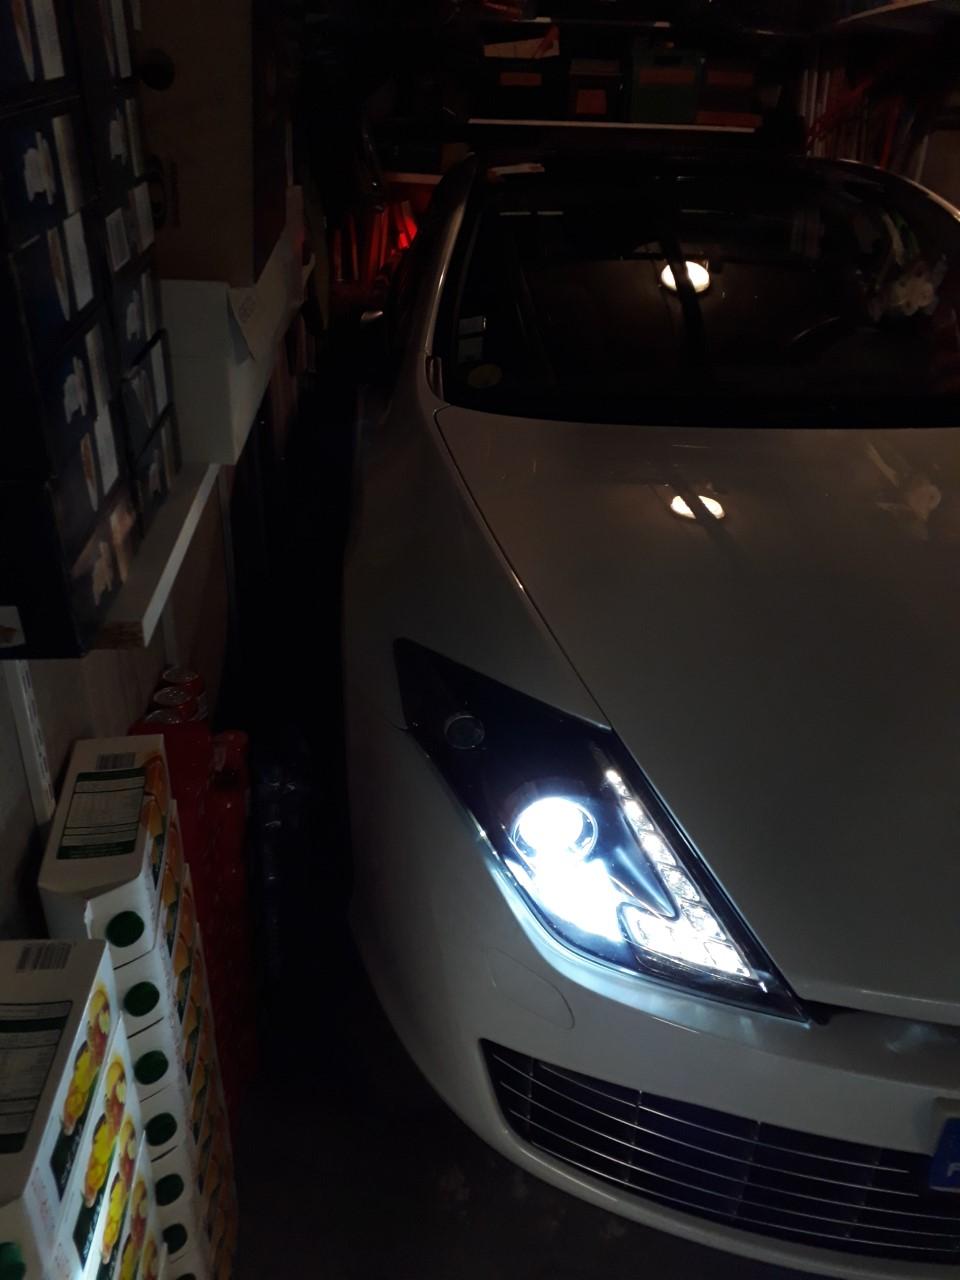 [Laurent66] LAGUNA III.2 Coupé 2.0 dCi 175 cv GP Monaco Bose Thumbn11